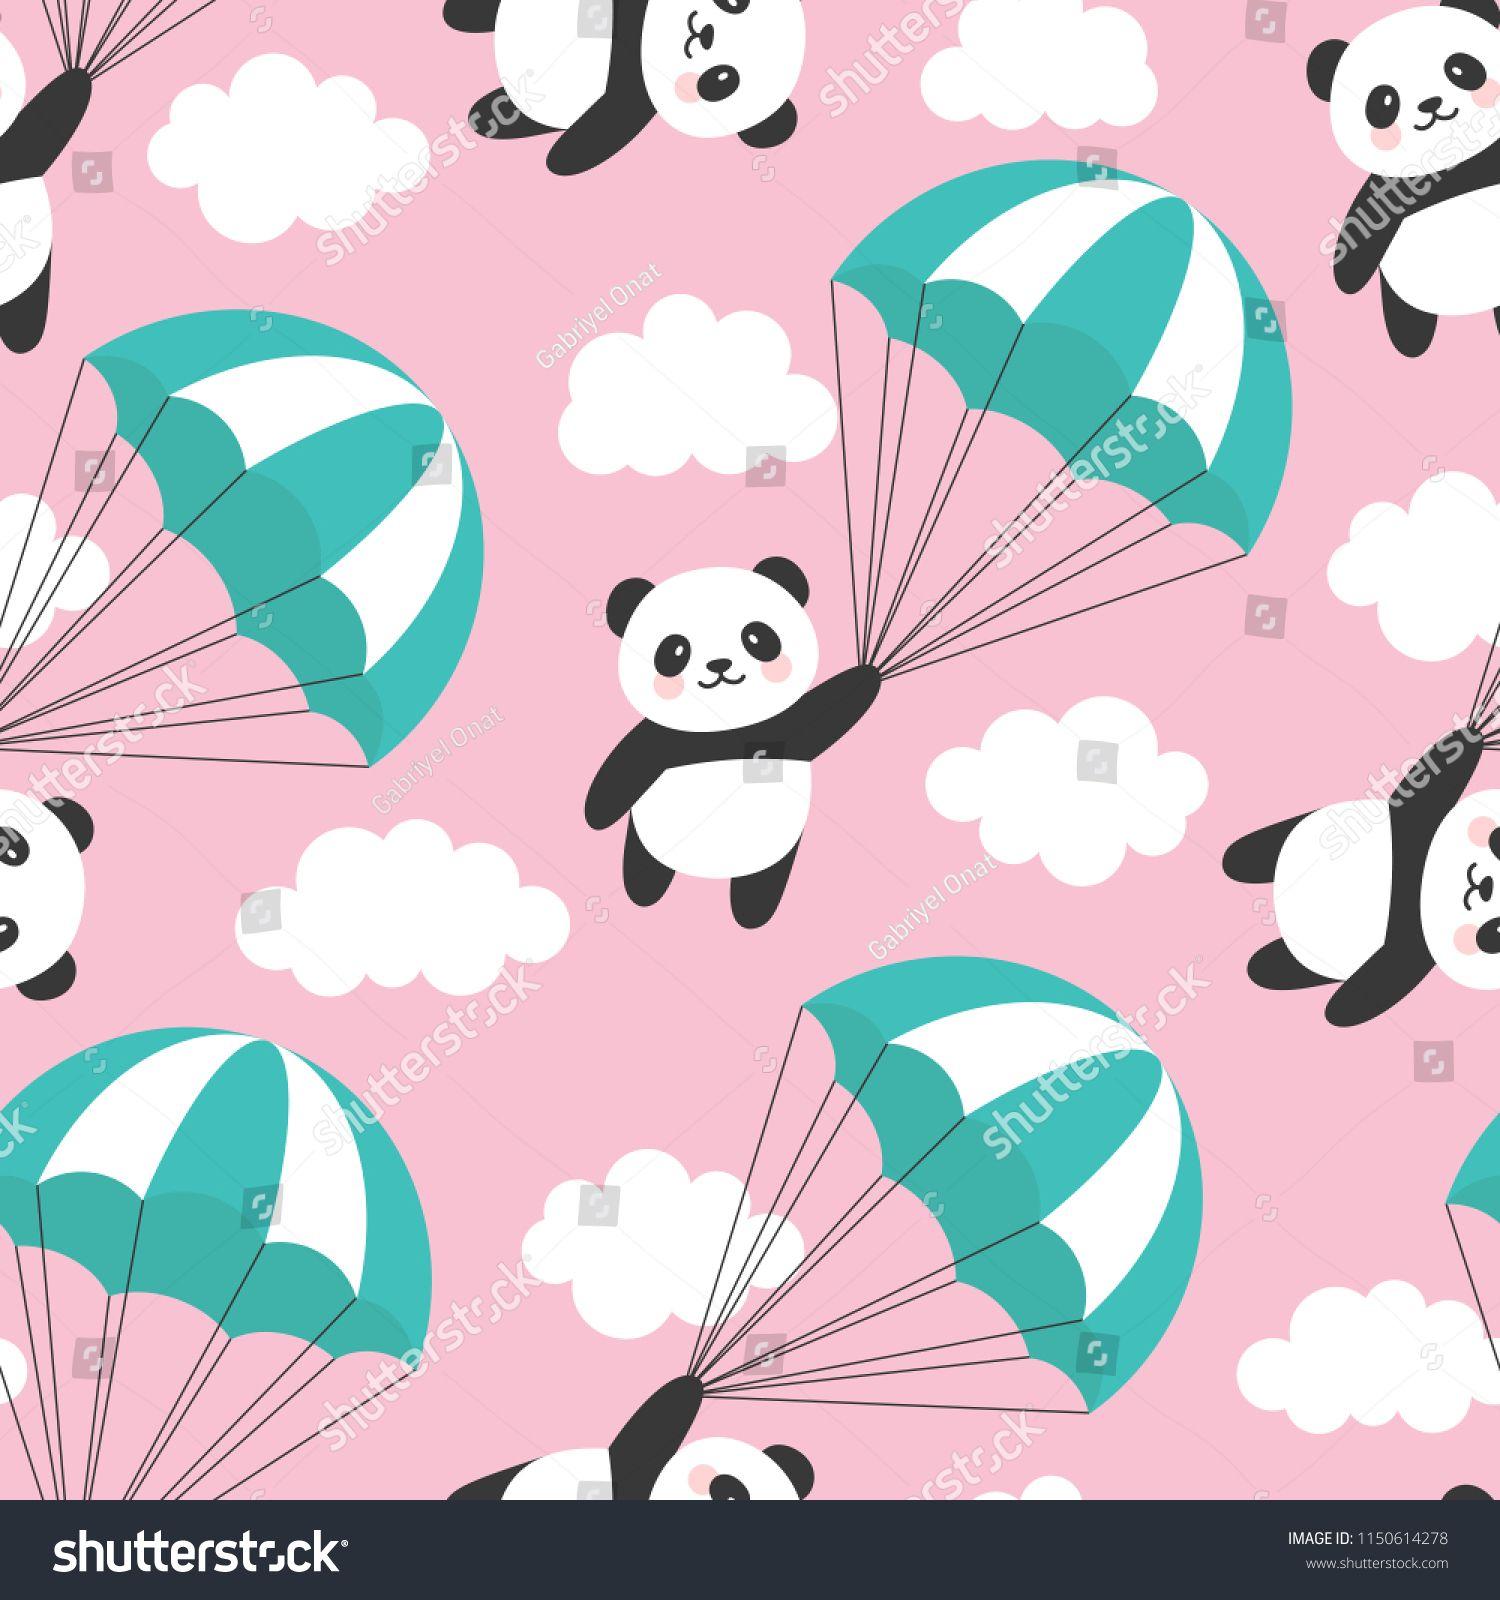 b3f9ef9ec82 Seamless Panda Pattern Background